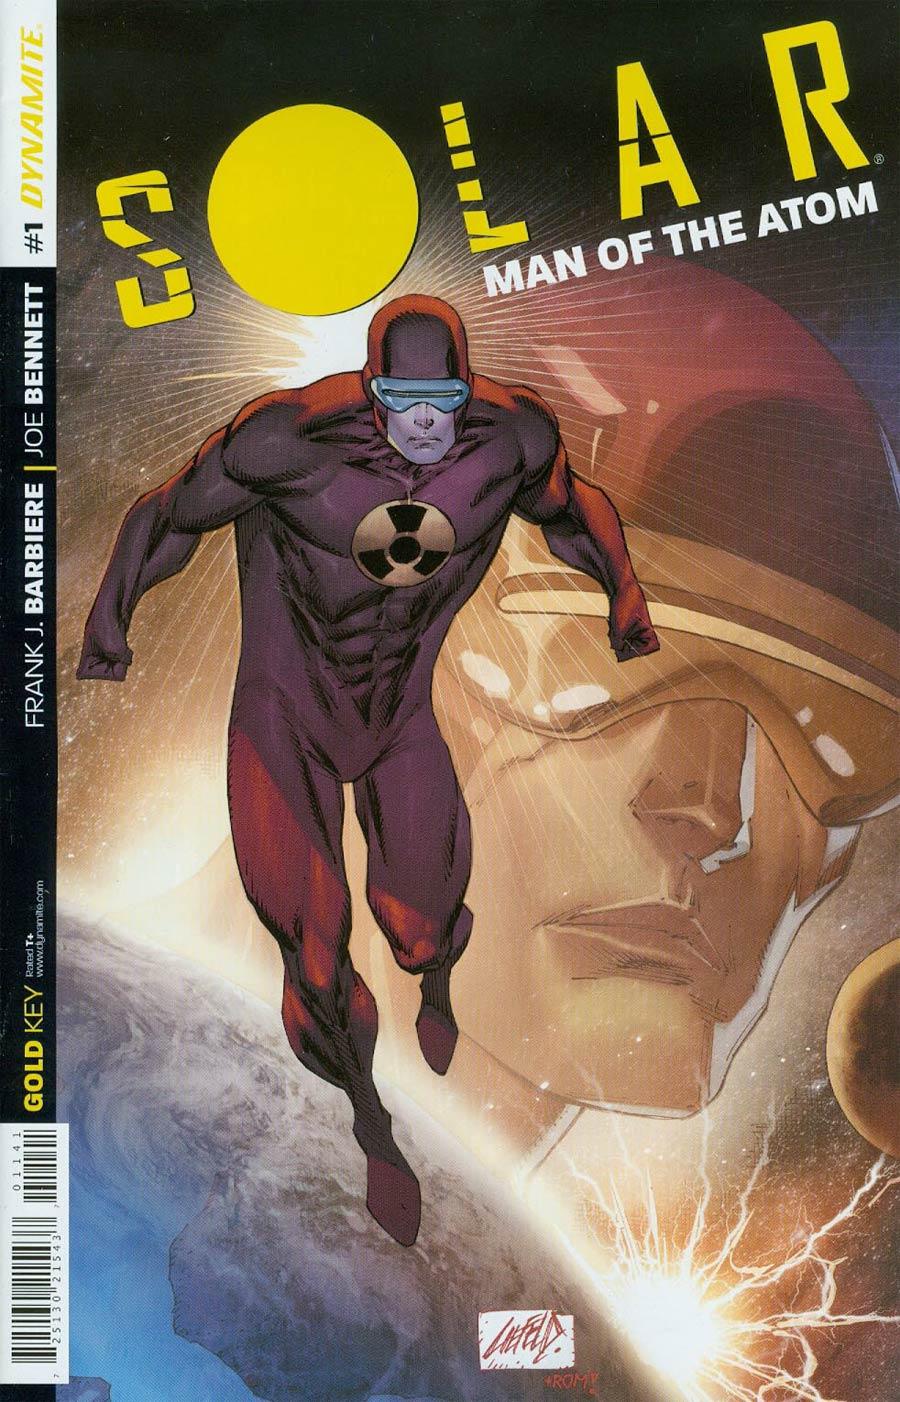 Solar Man Of The Atom Vol 2 #1 Cover E Variant Rob Liefeld Color Rare Variant Cover